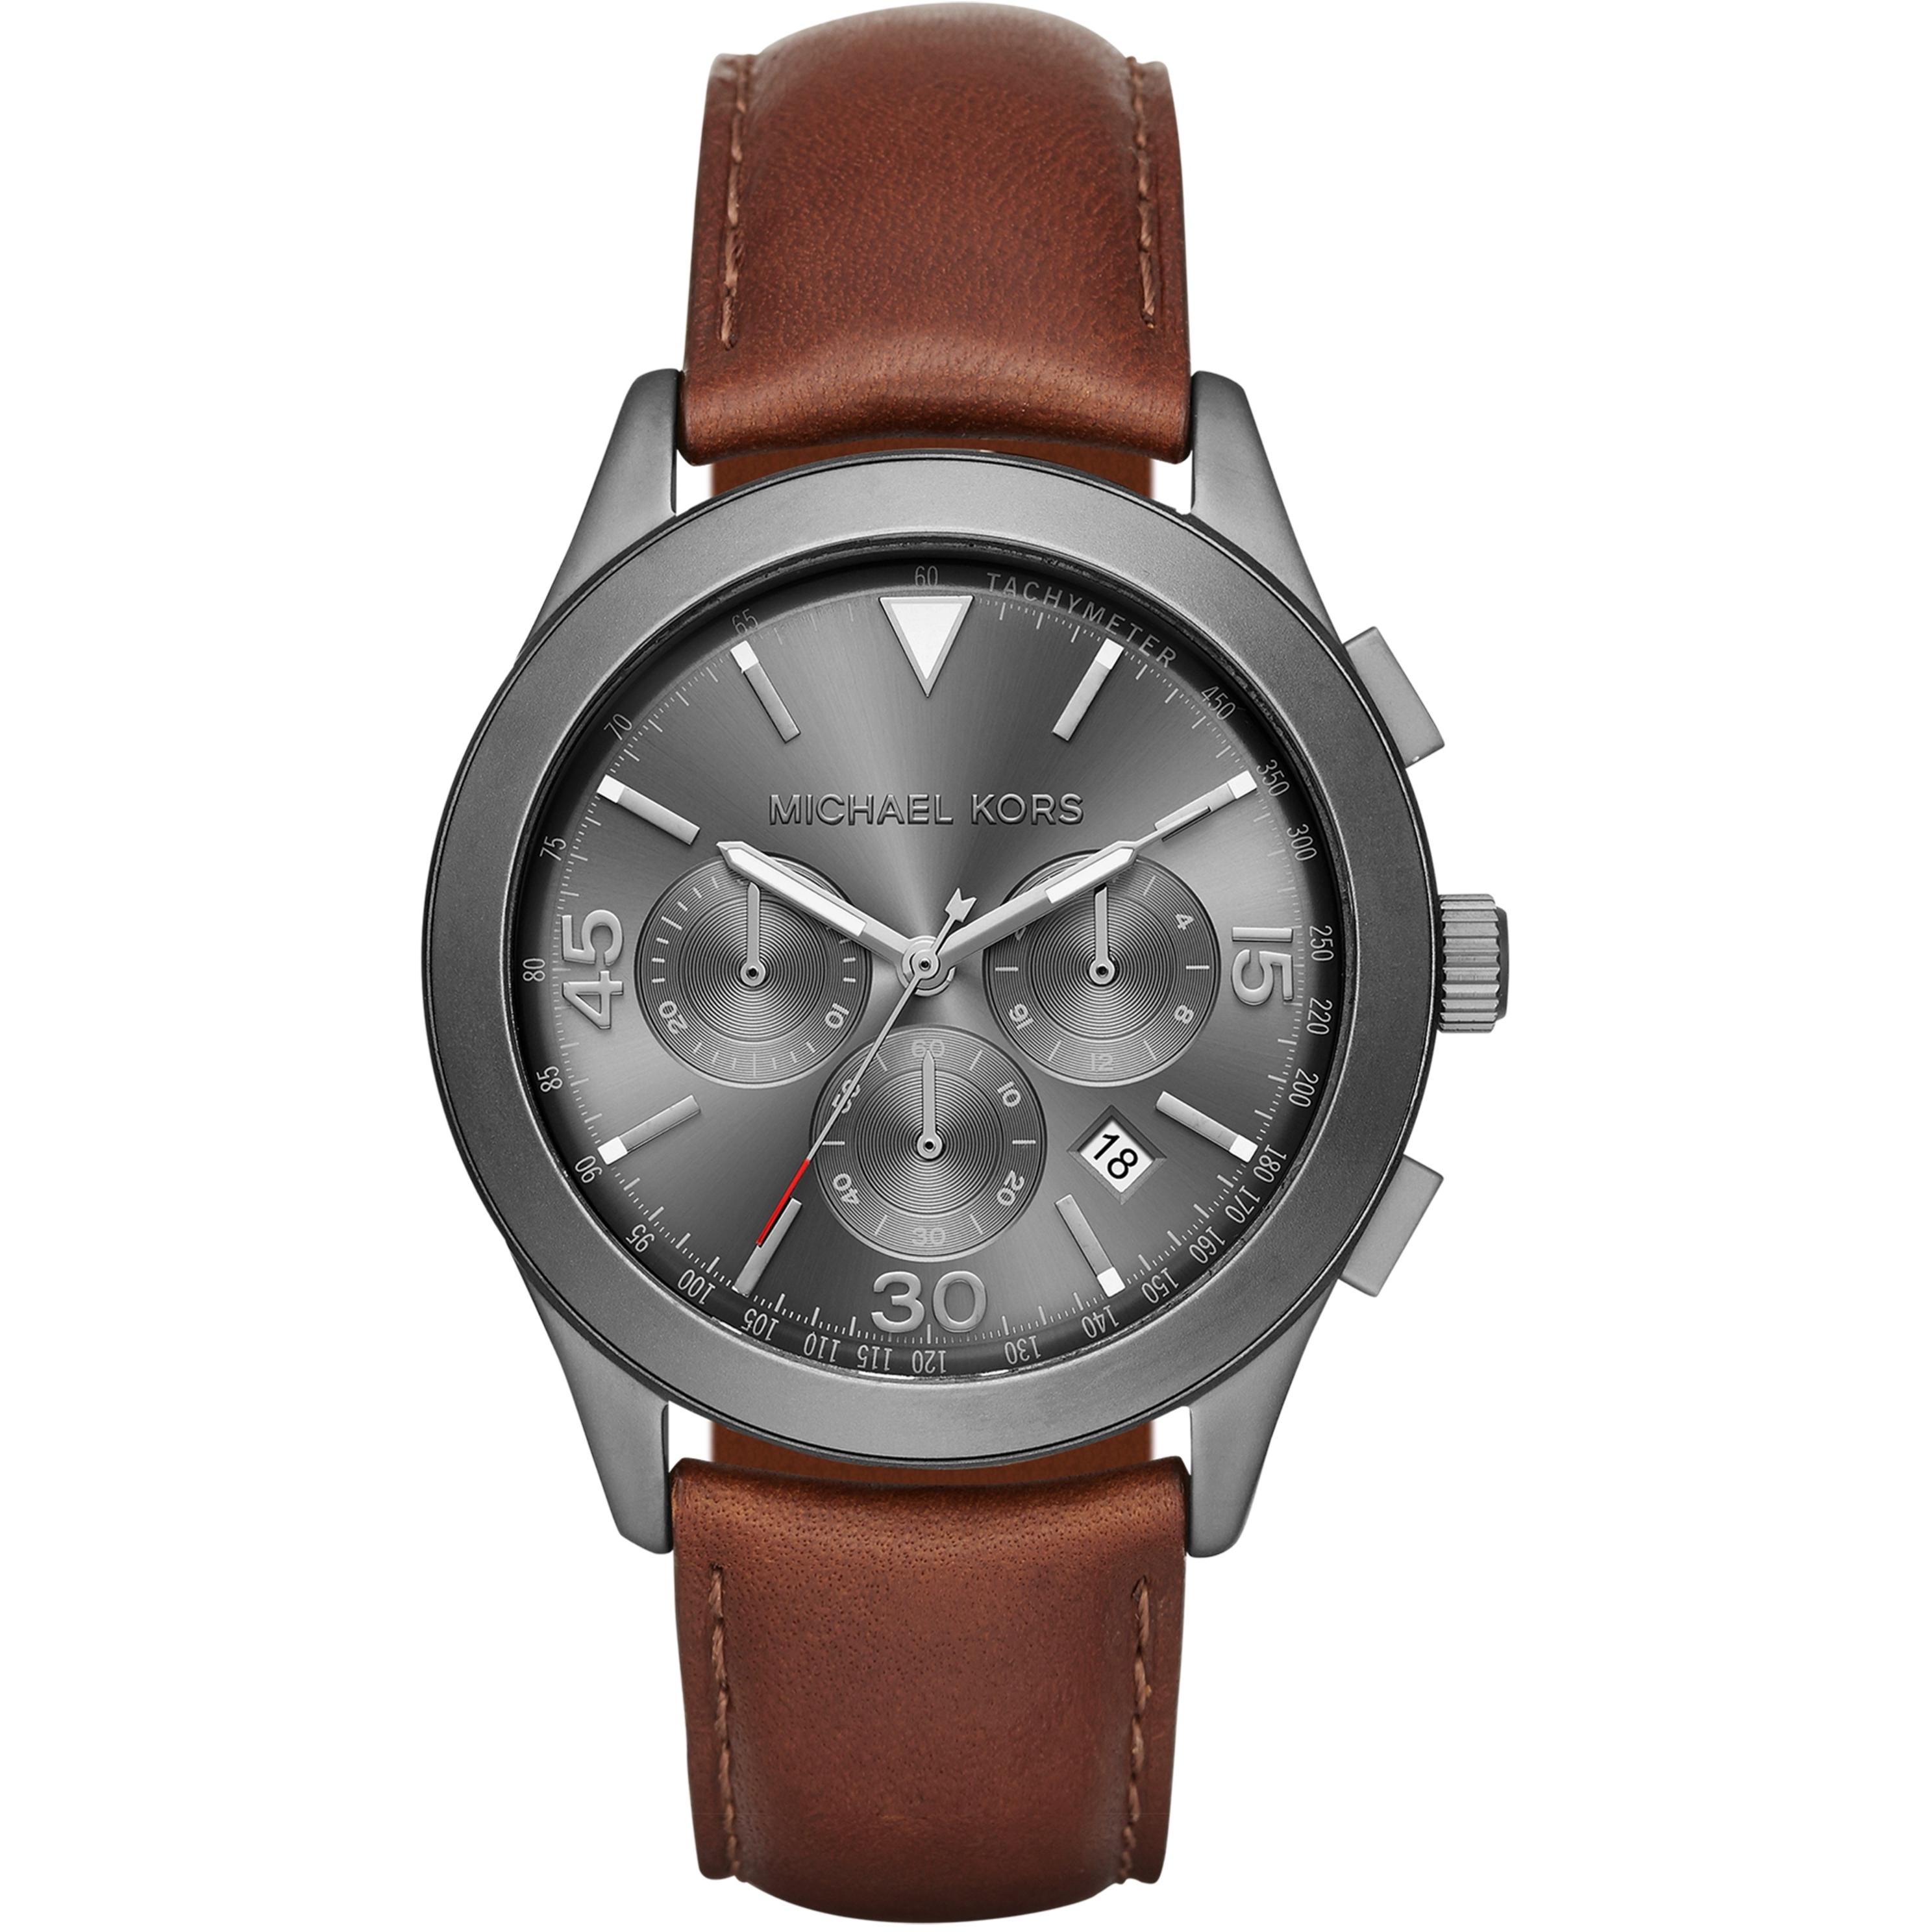 8a583bba0e 1e0d6f204e29 Gents Michael Kors Gareth Chronograph Watch (MK8471) ...